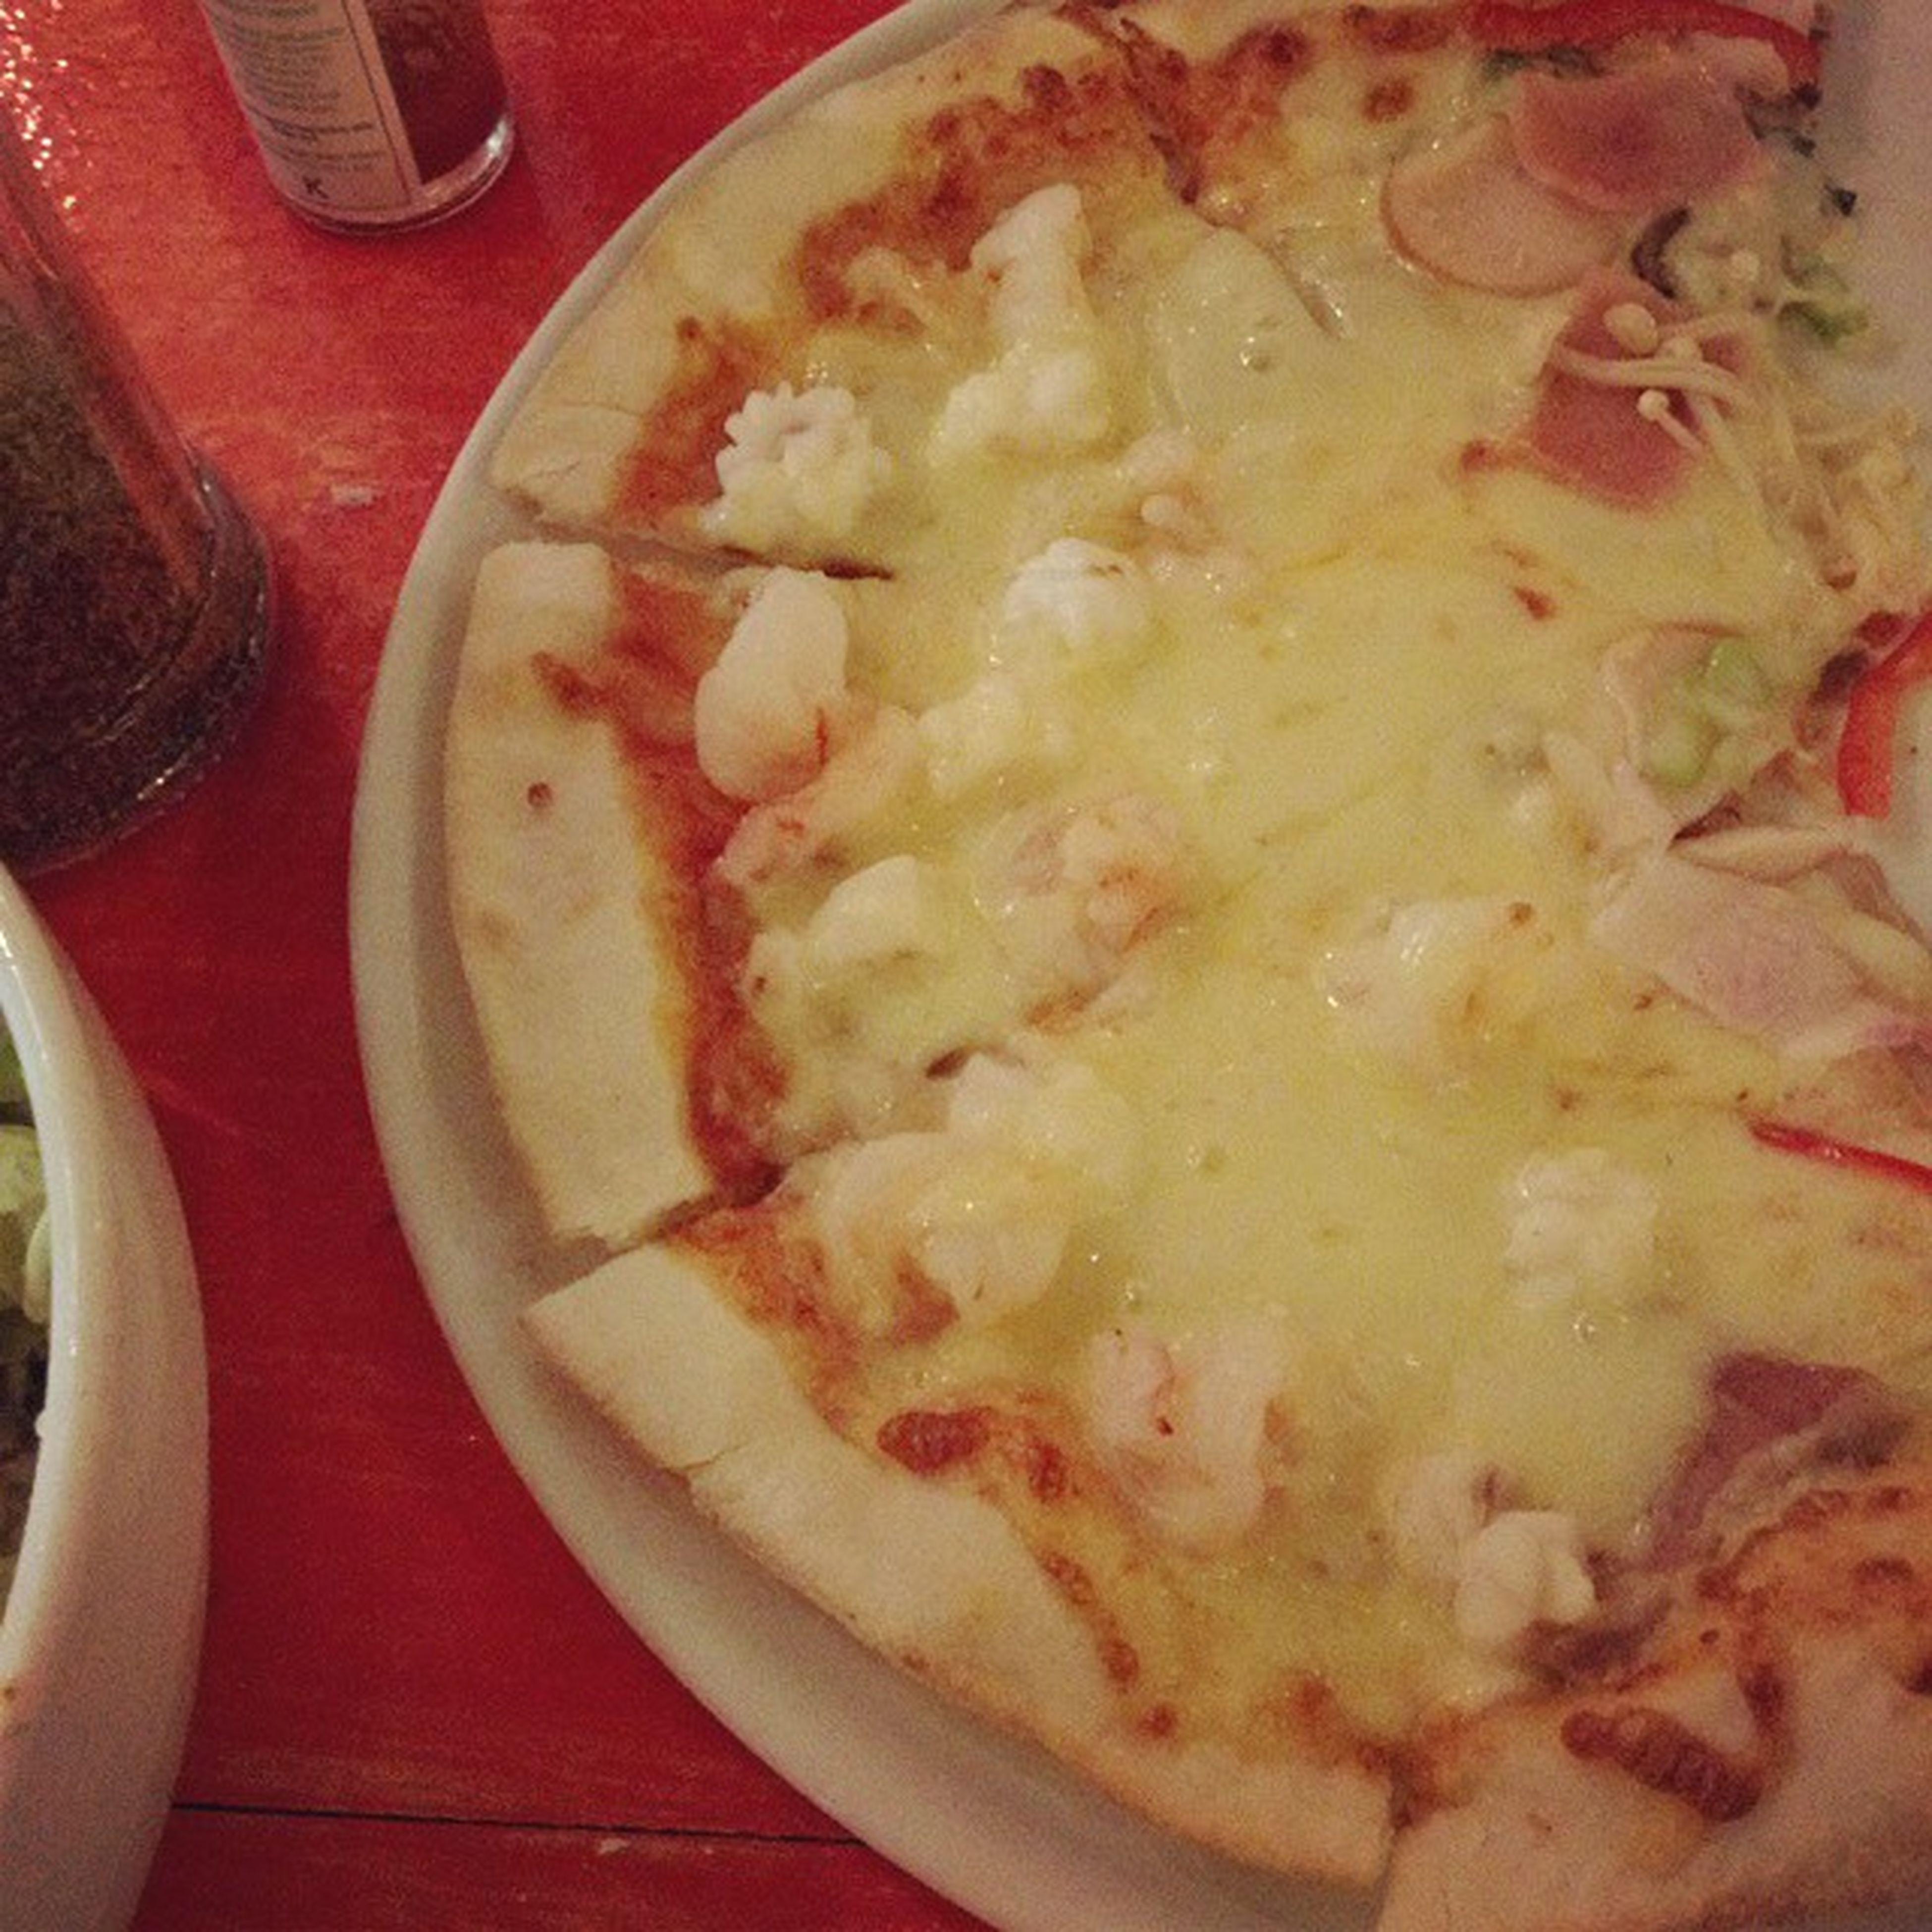 Pizza cheese อร่อยๆๆๆ แนะนำเลย Bigmama แป้งบาง กรอบ สำคัญตรงชีสนี่แหละ เยอะยืด